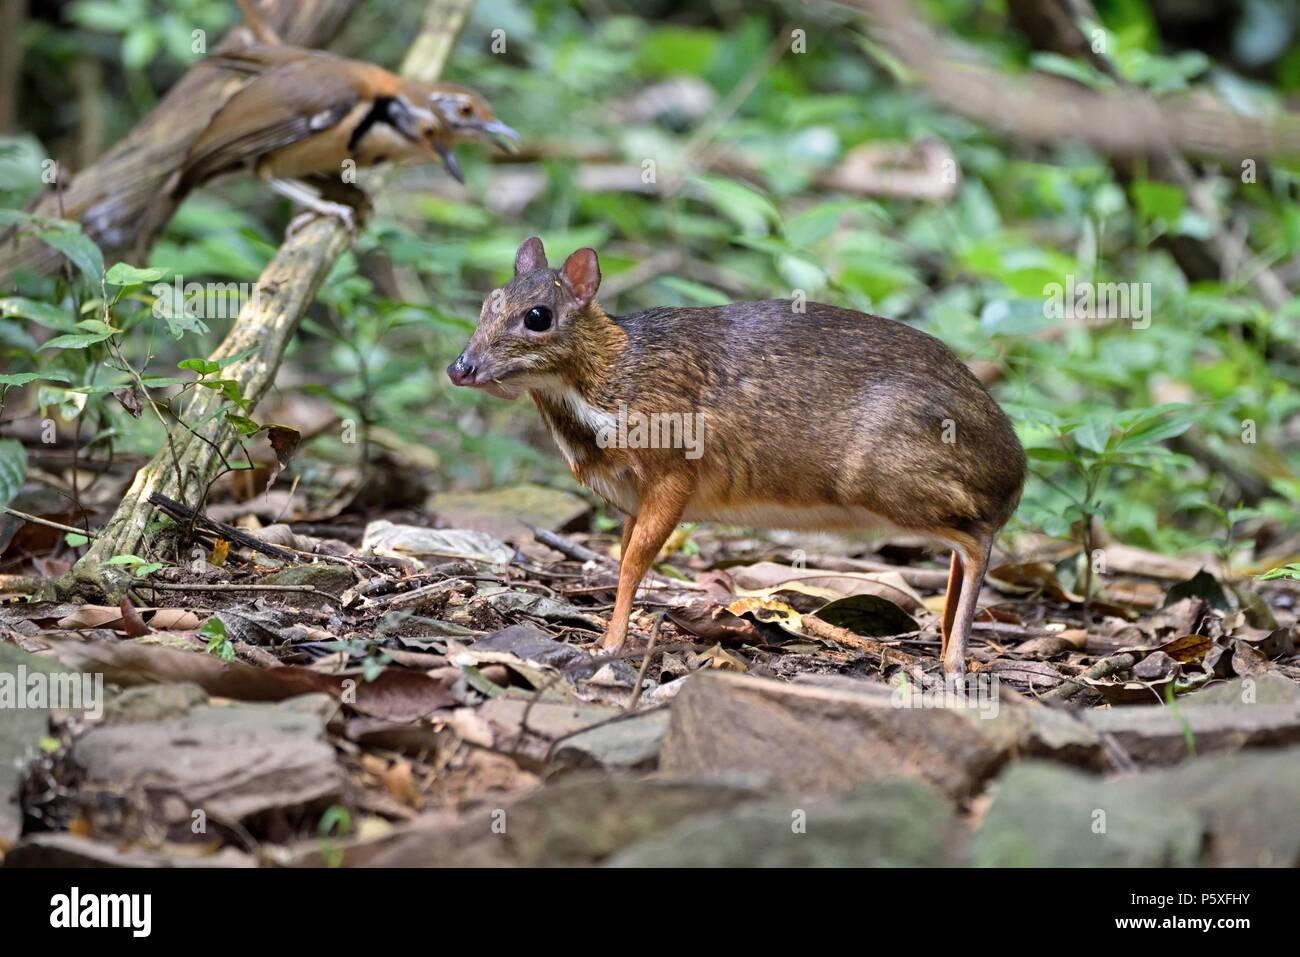 Kanchil - deer-baby from the rainforest